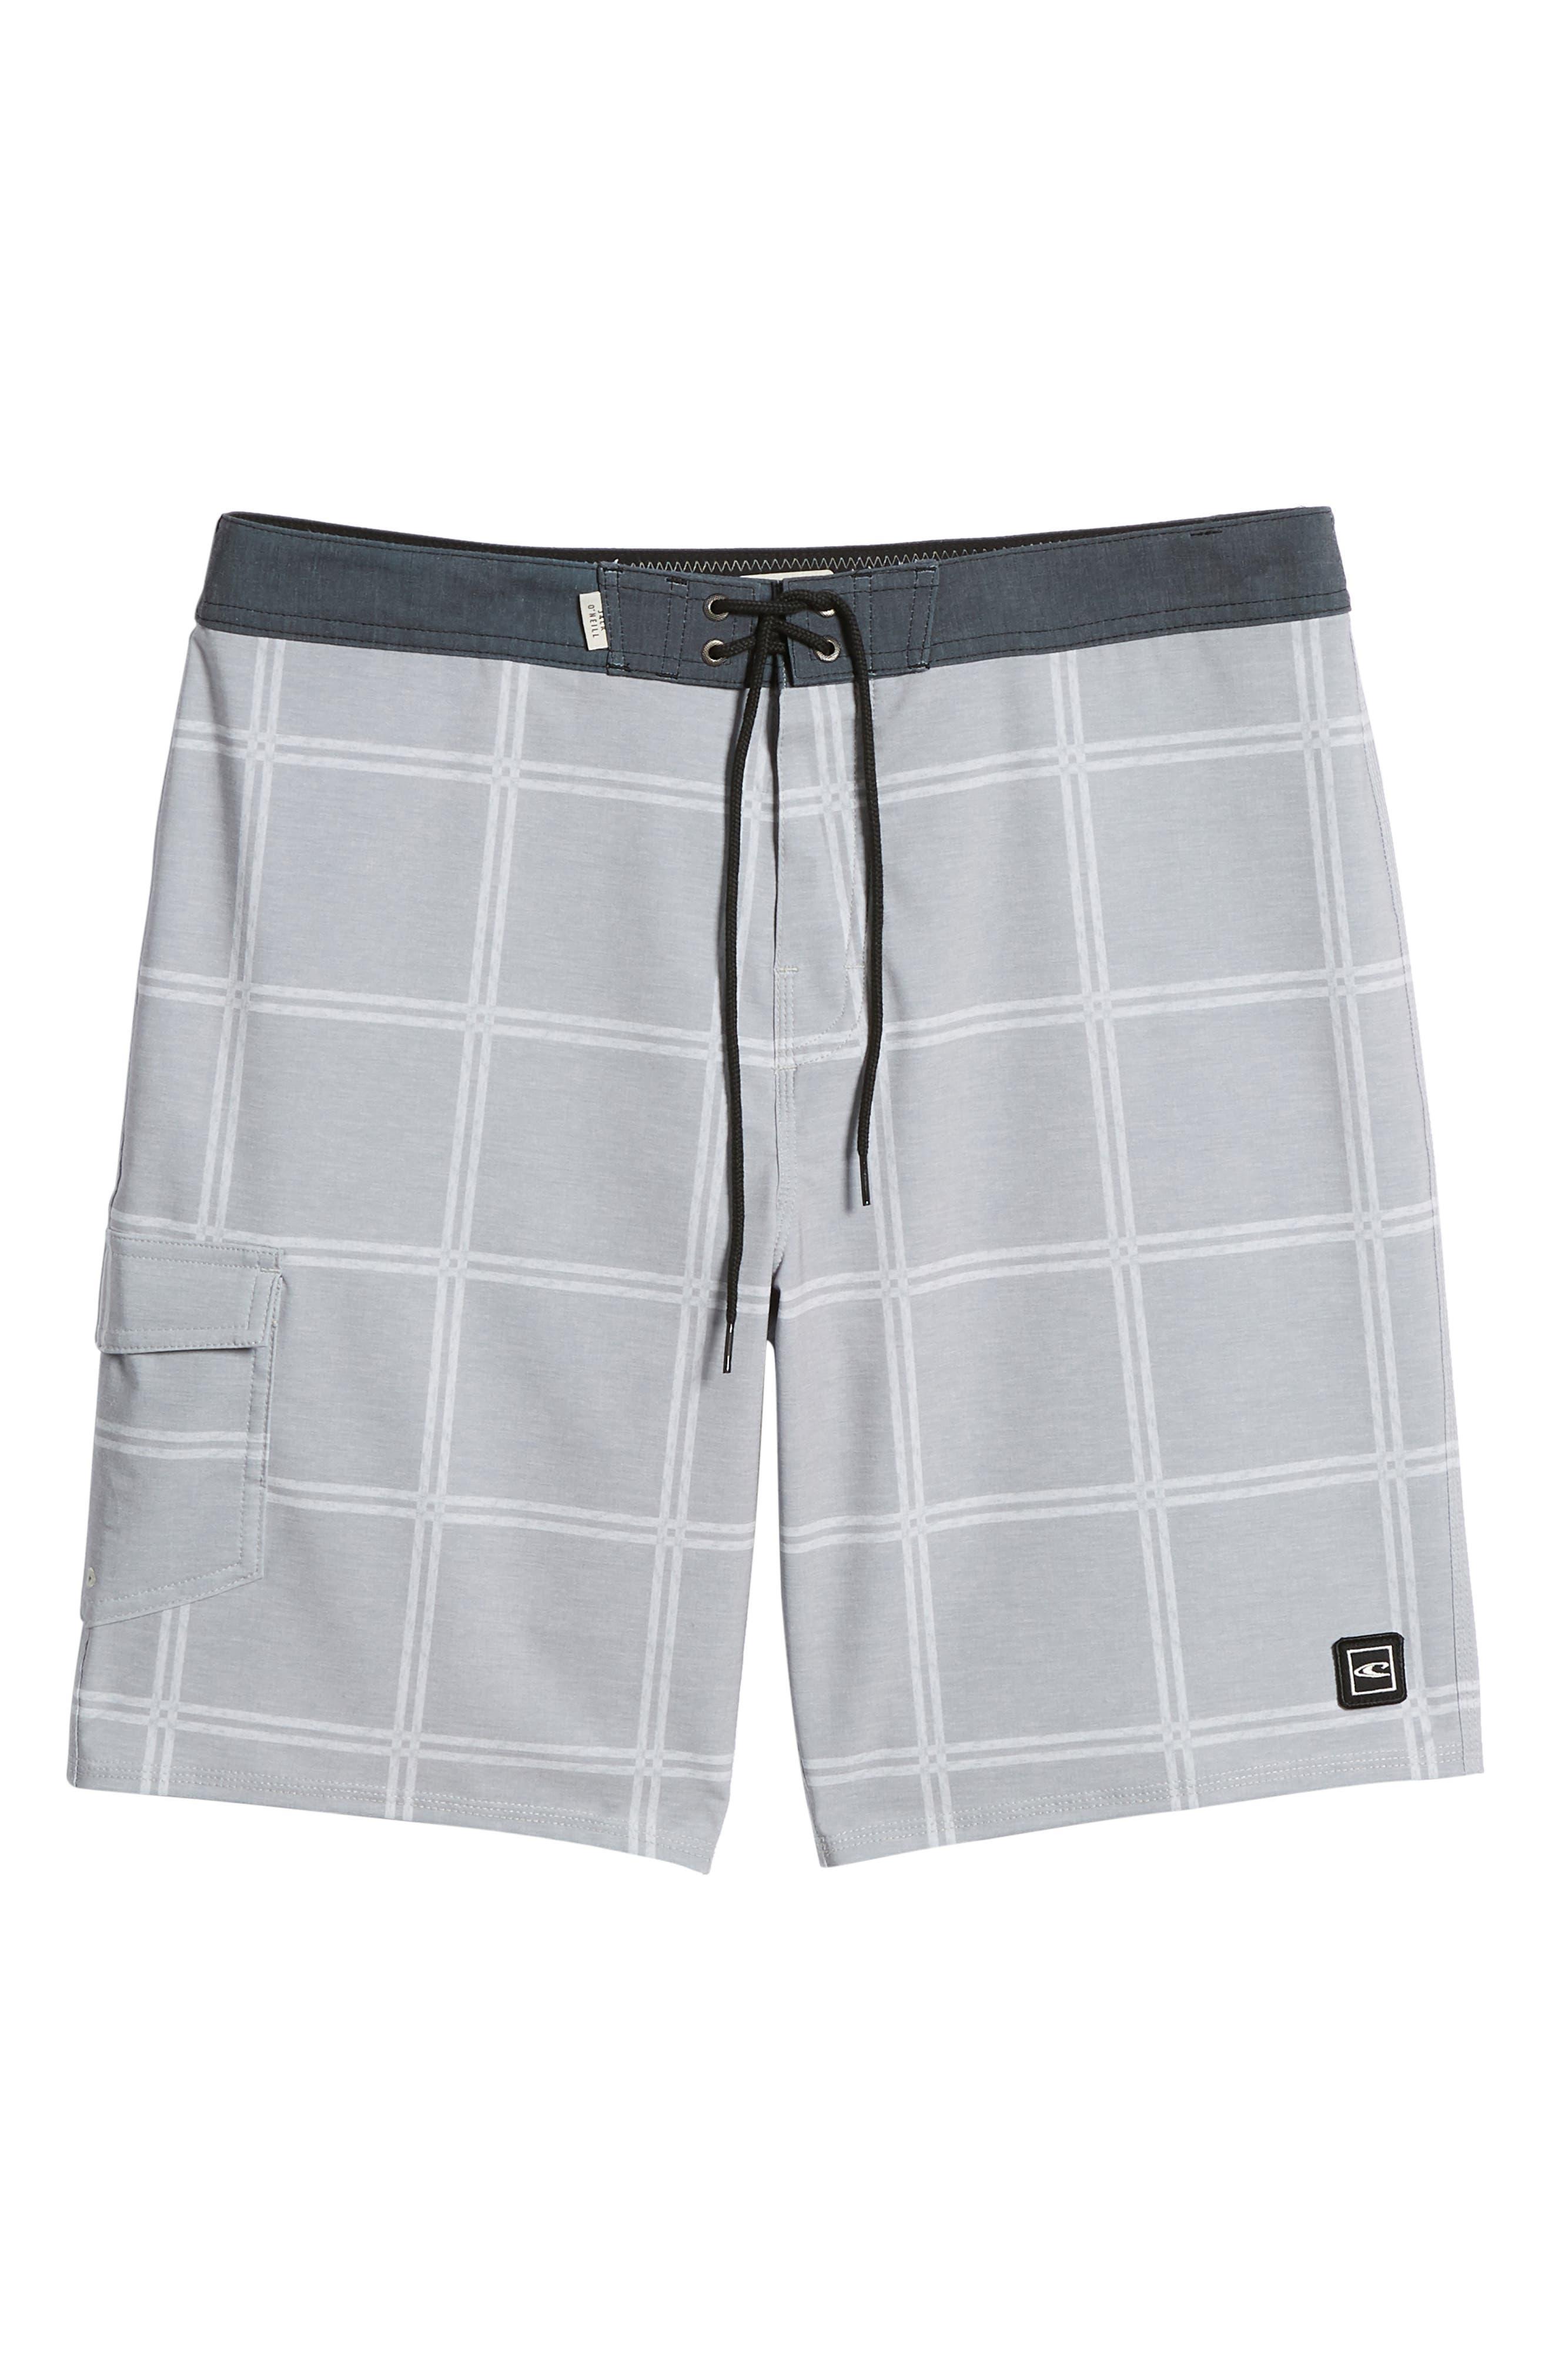 Head High Board Shorts,                             Alternate thumbnail 6, color,                             020